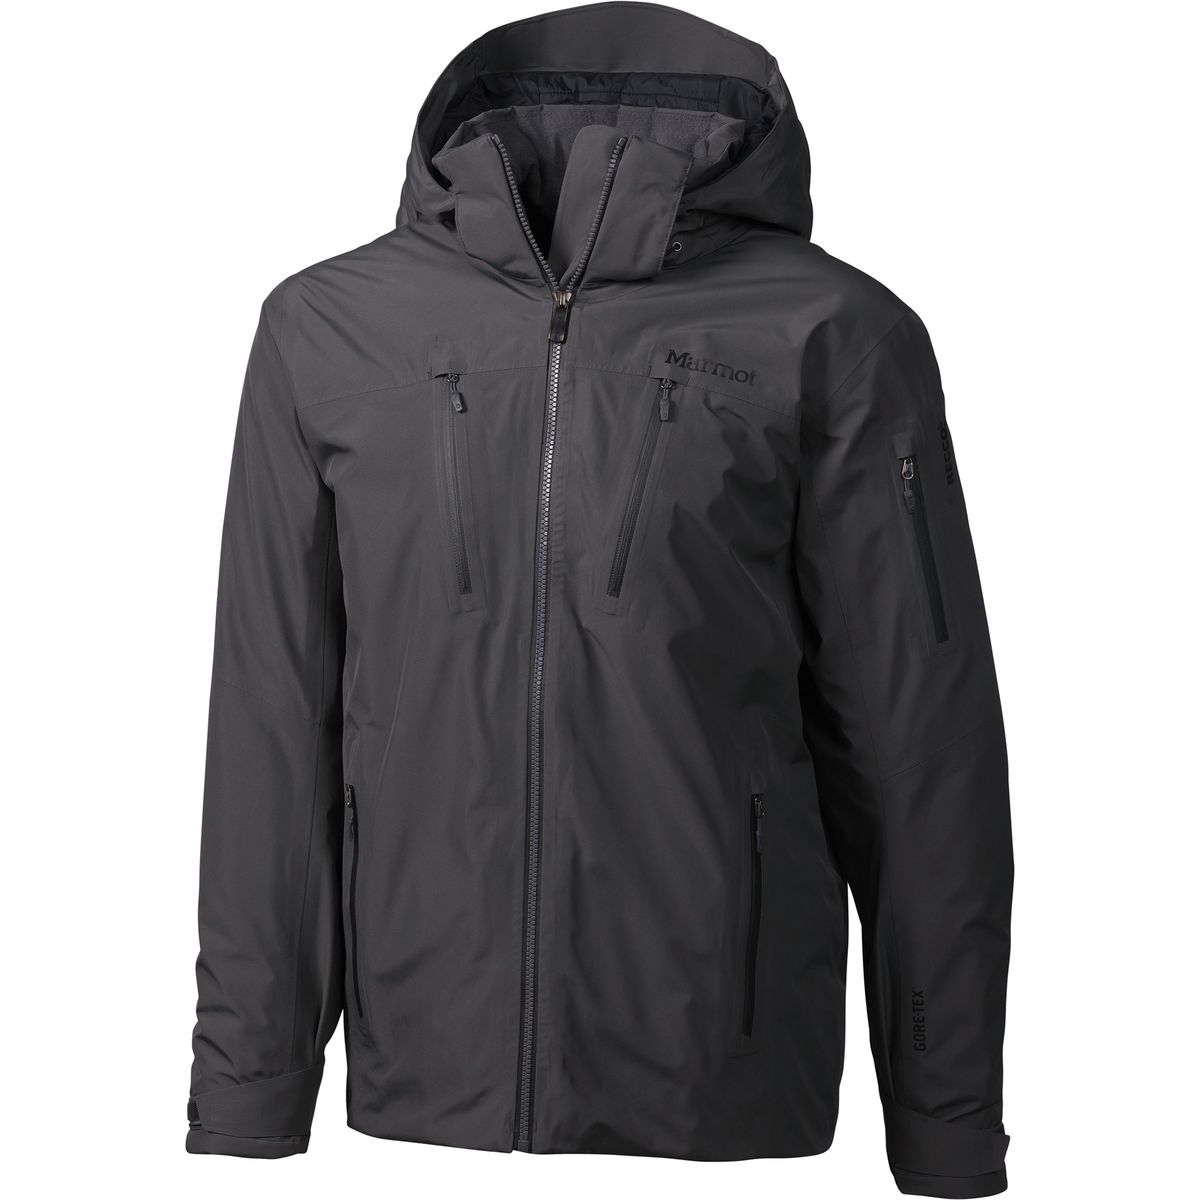 Marmot Mainline Jacket - Men